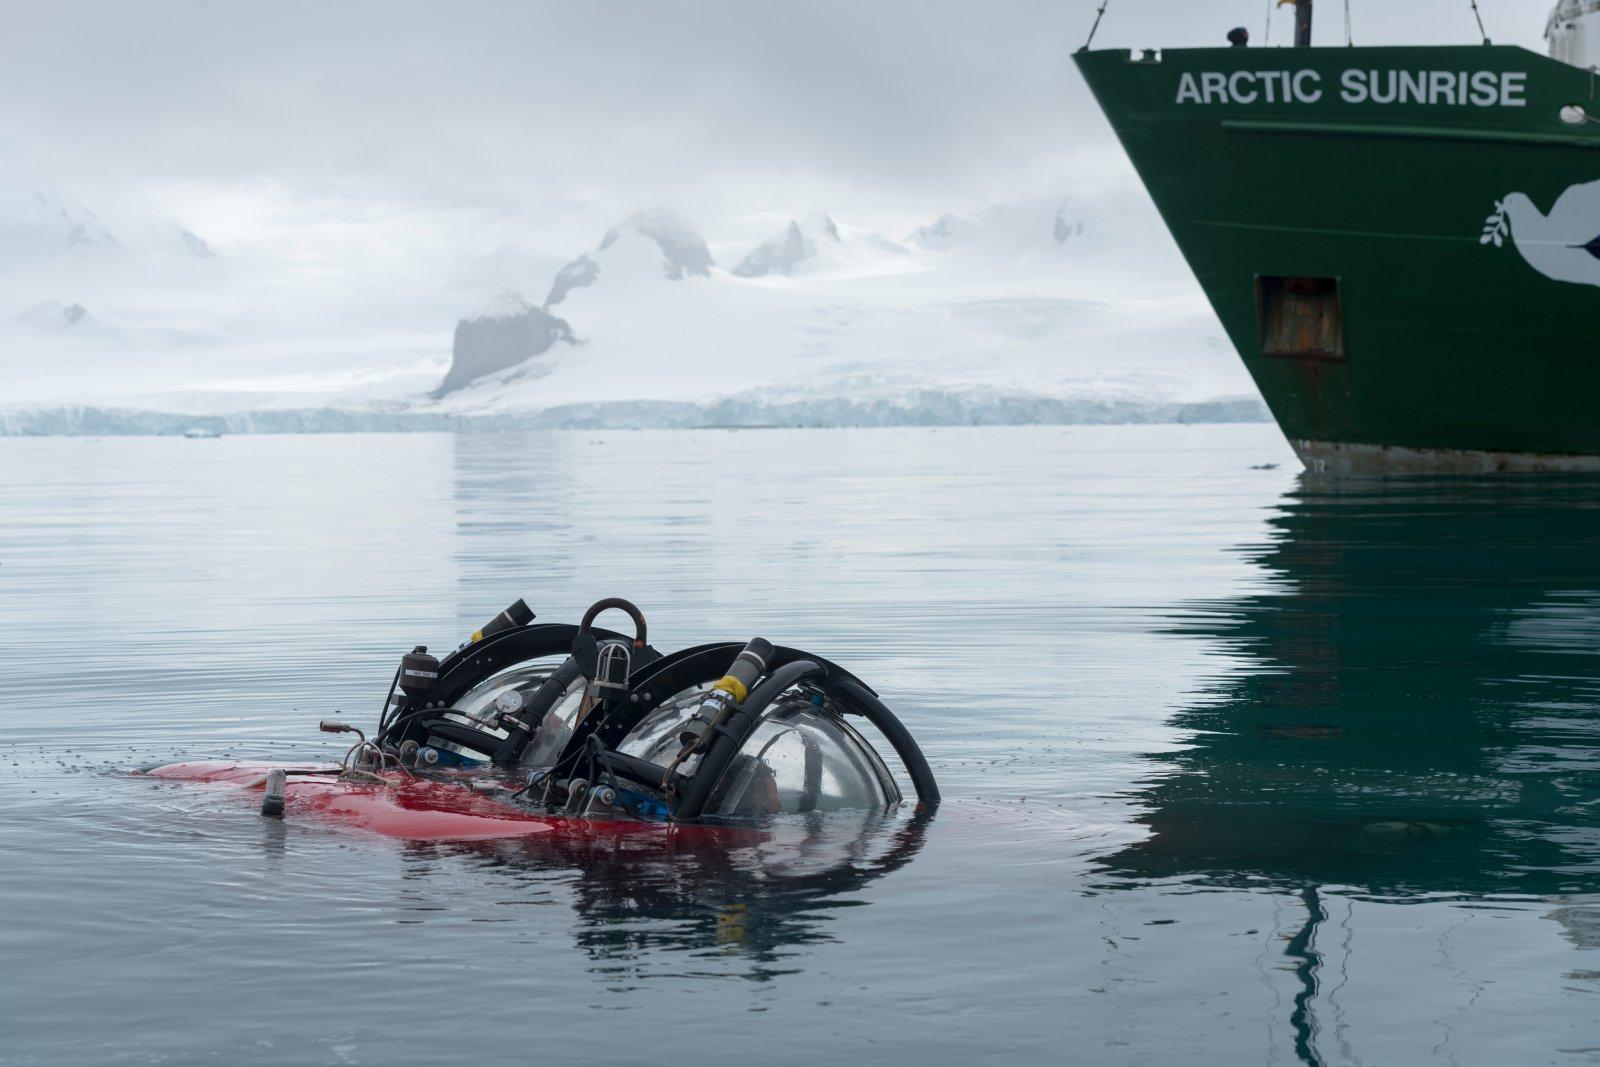 El submarí de l'Arctic Sunrise entrant a les aigües de l'Antàrtic